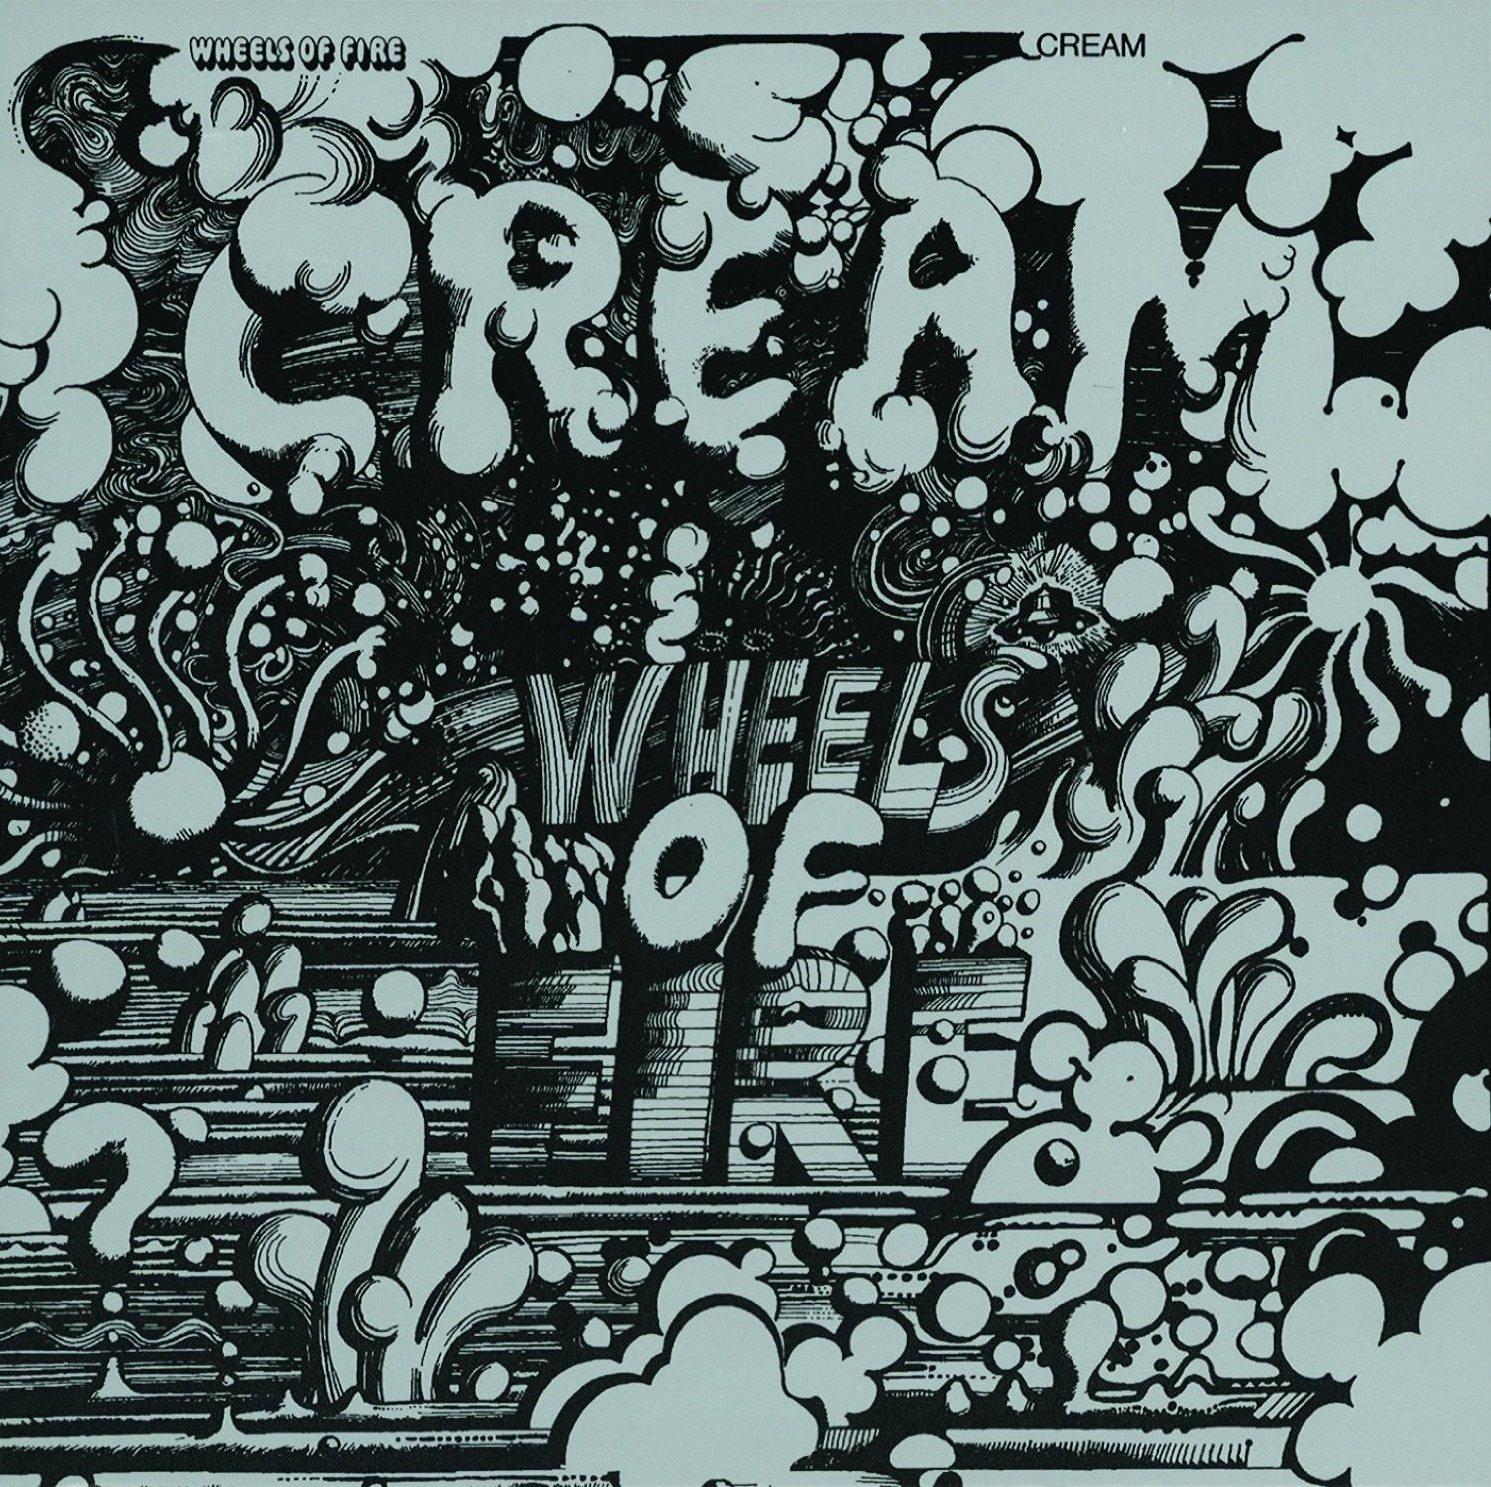 Cream: Wheels of Fire - Universal Records (Japan) SHM-SACD (UIGY-15003)